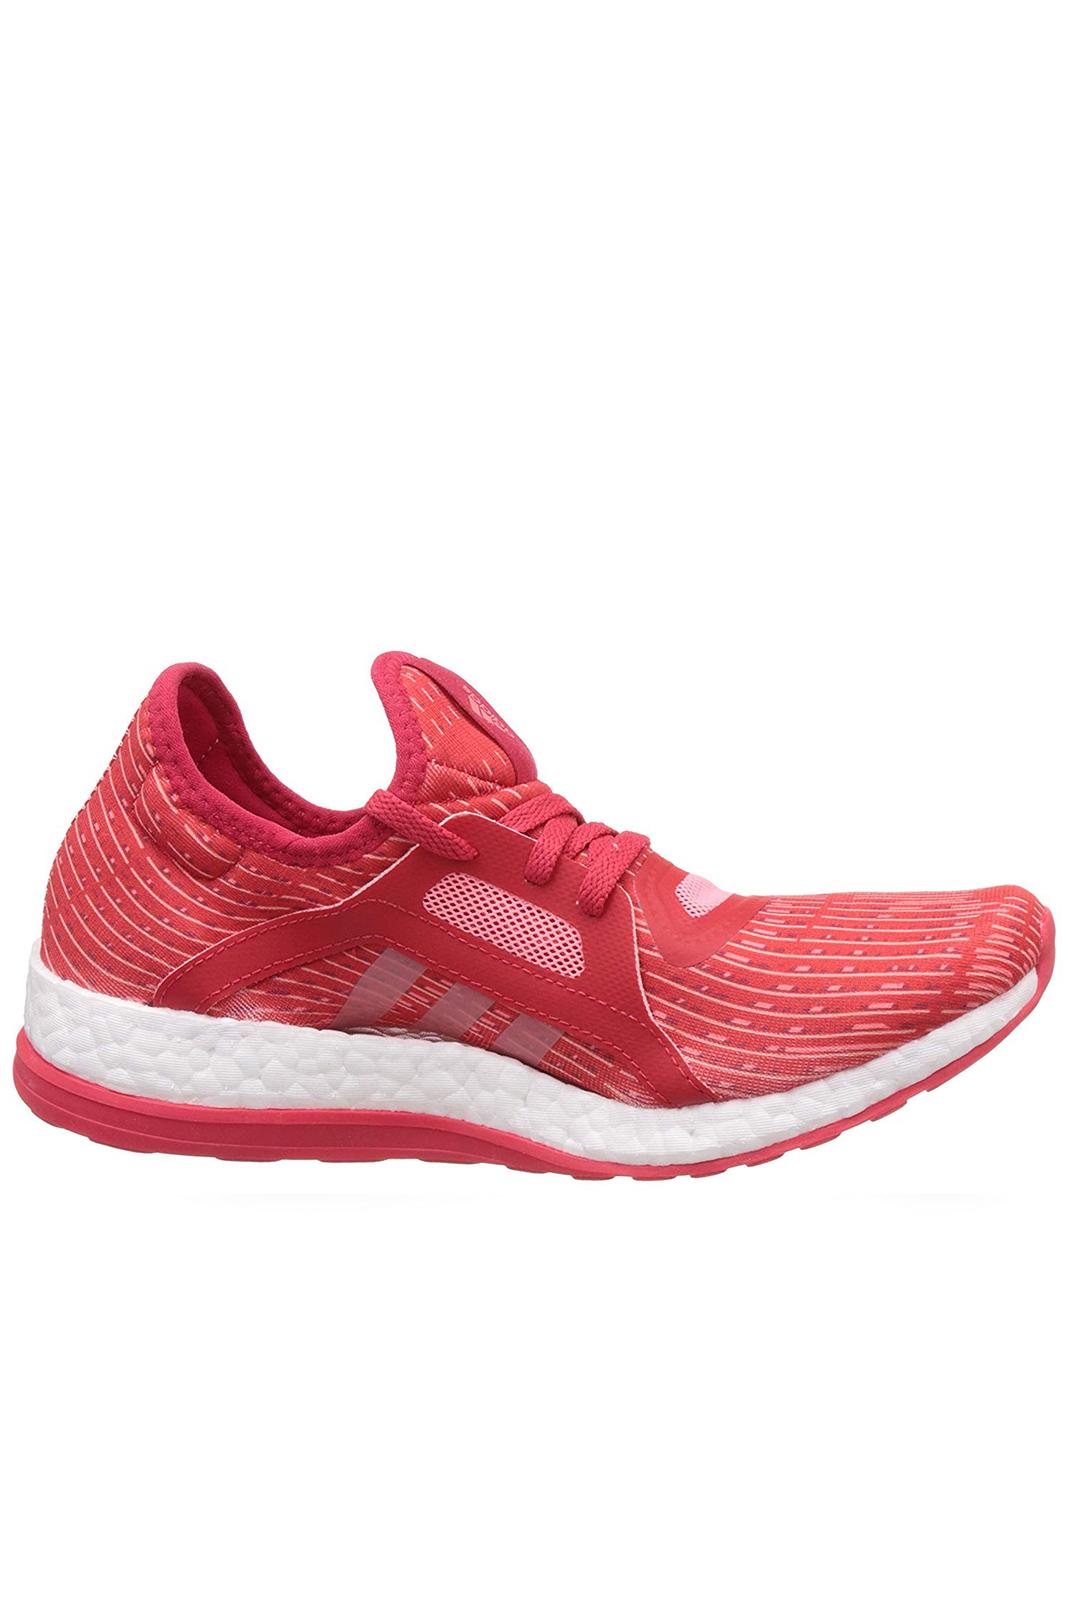 Baskets / Sneakers  Adidas AQ3399 PUREBOOST X ROSE